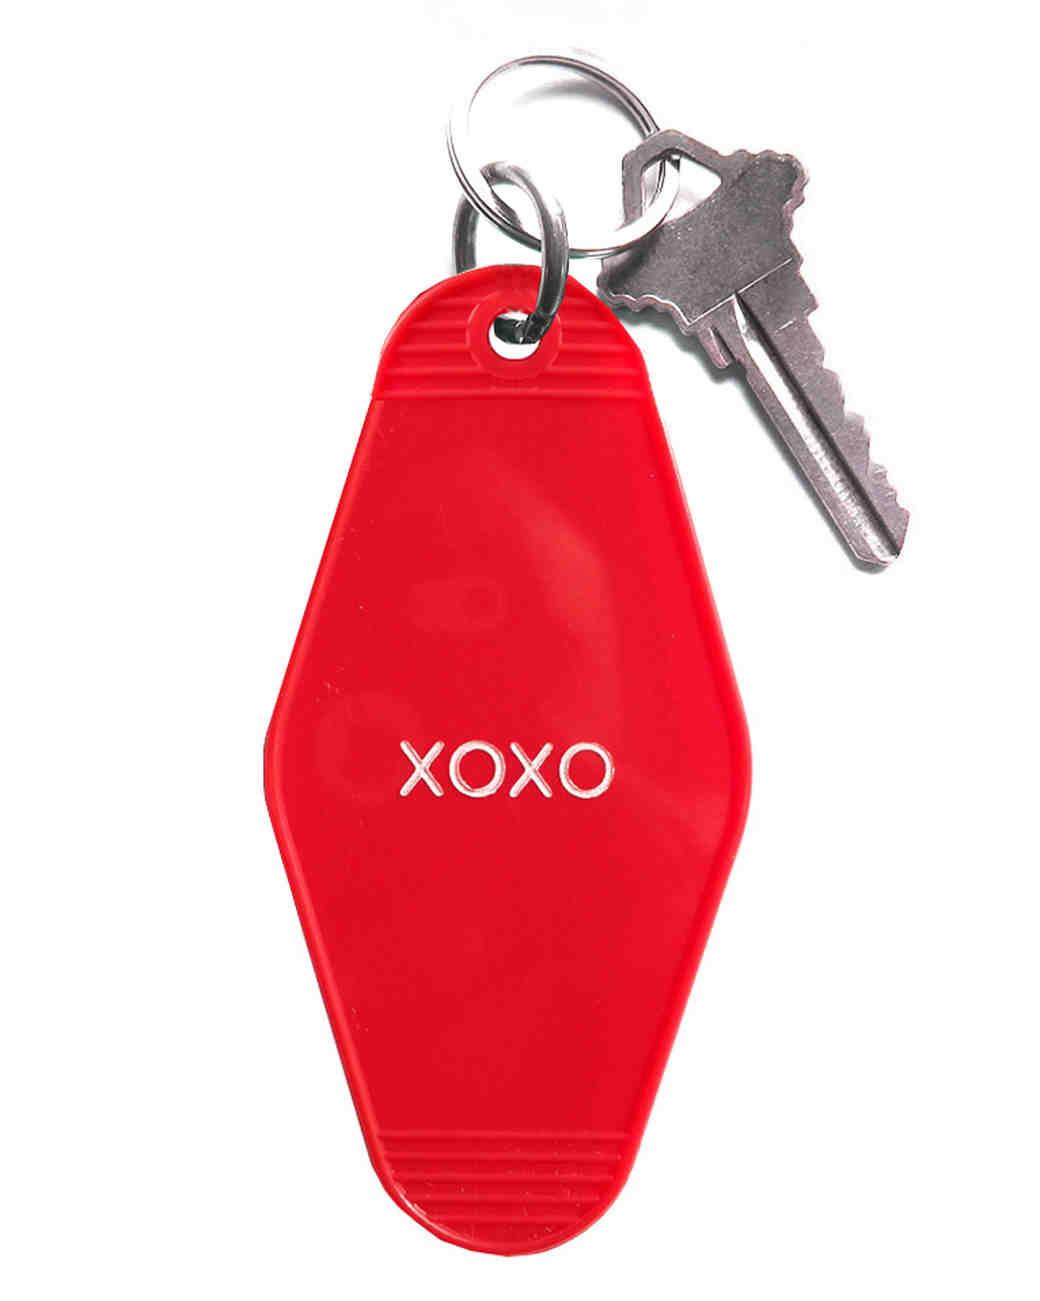 valentines-gift-guide-her-three-potato-four-keychain-xoxo-0115.jpg